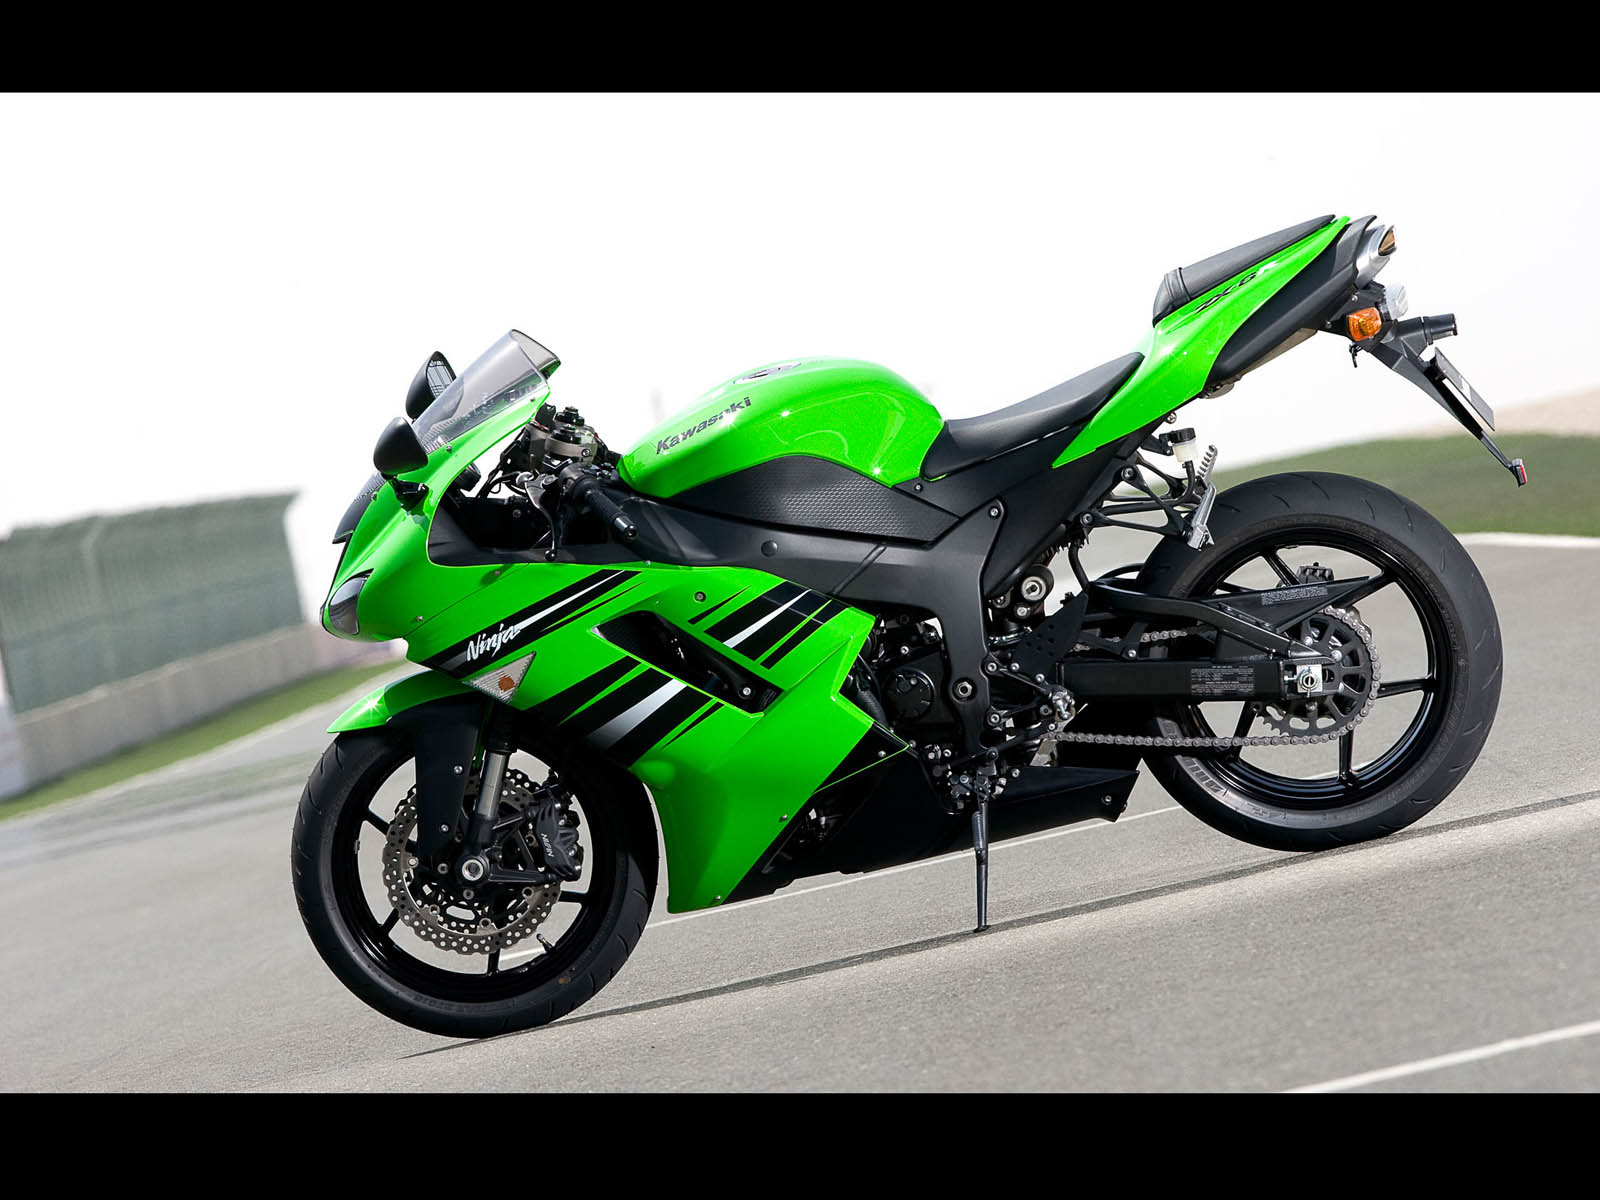 Download Free 3d Wallpapers For Windows 8 Wallpapers Kawasaki Ninja Zx 6r Bike